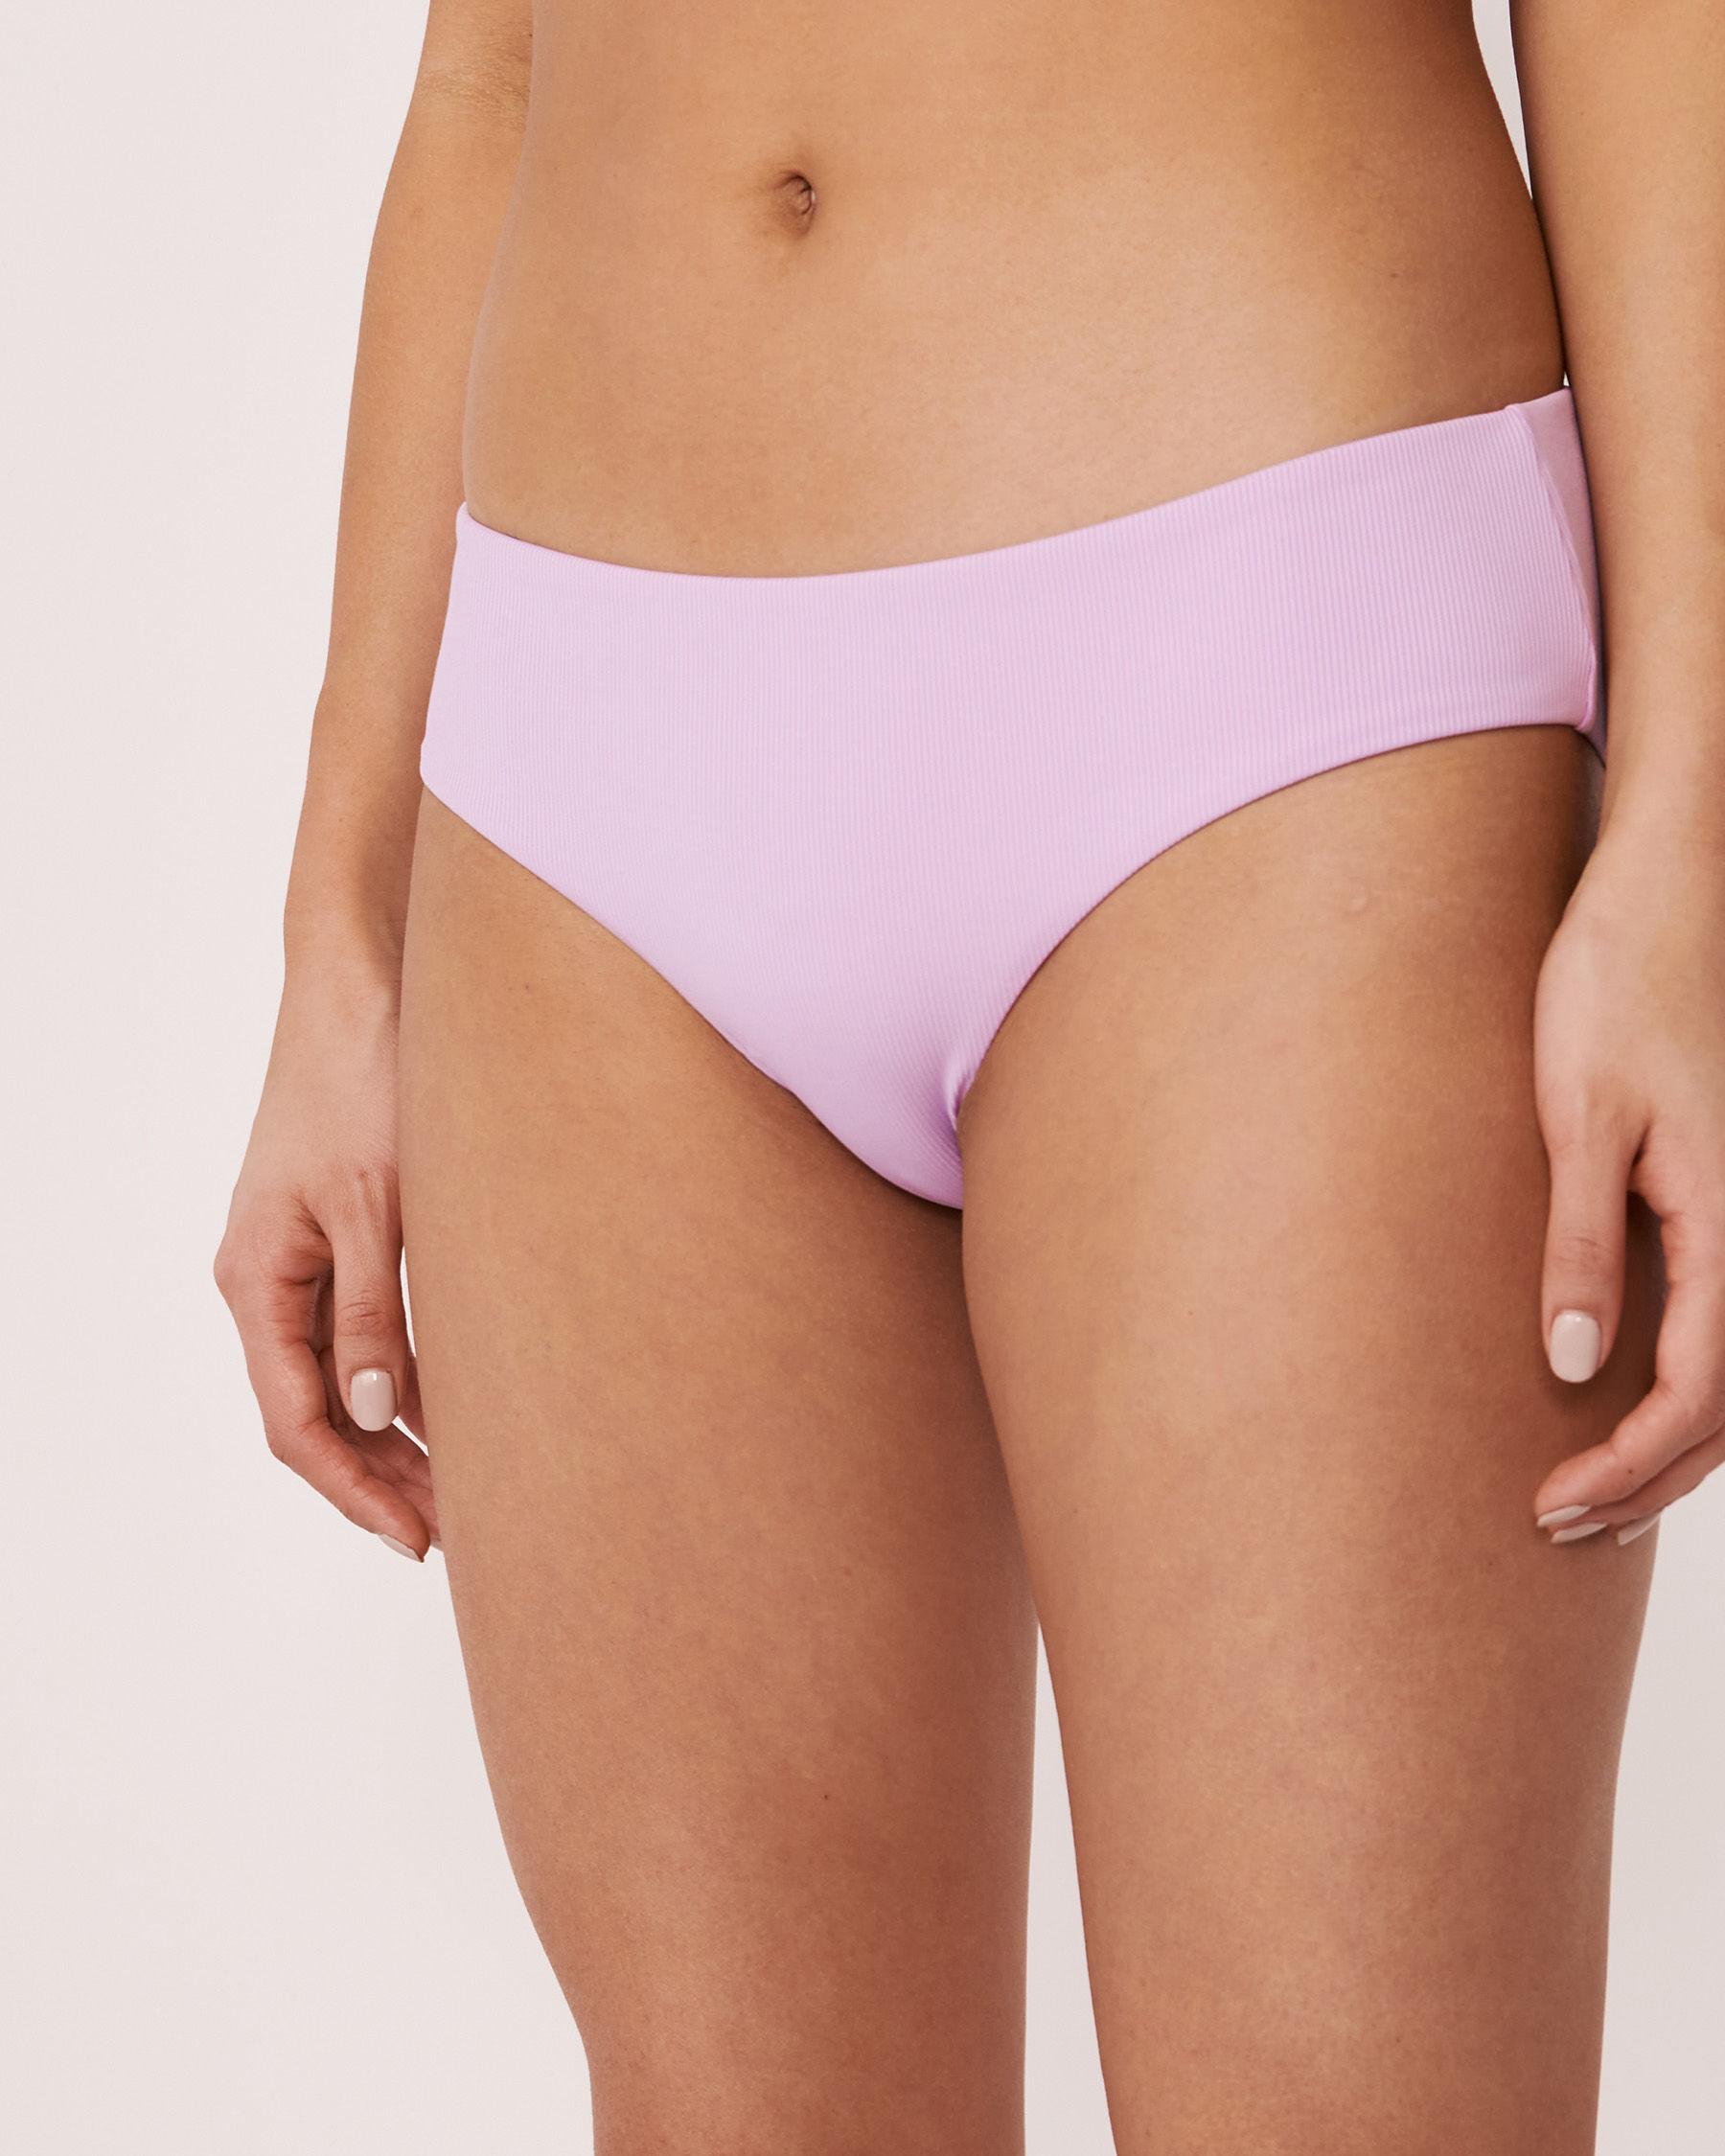 AQUAROSE SOLID RIB Recycled Fibers Hipster Bikini Bottom Lilac 70300051 - View1